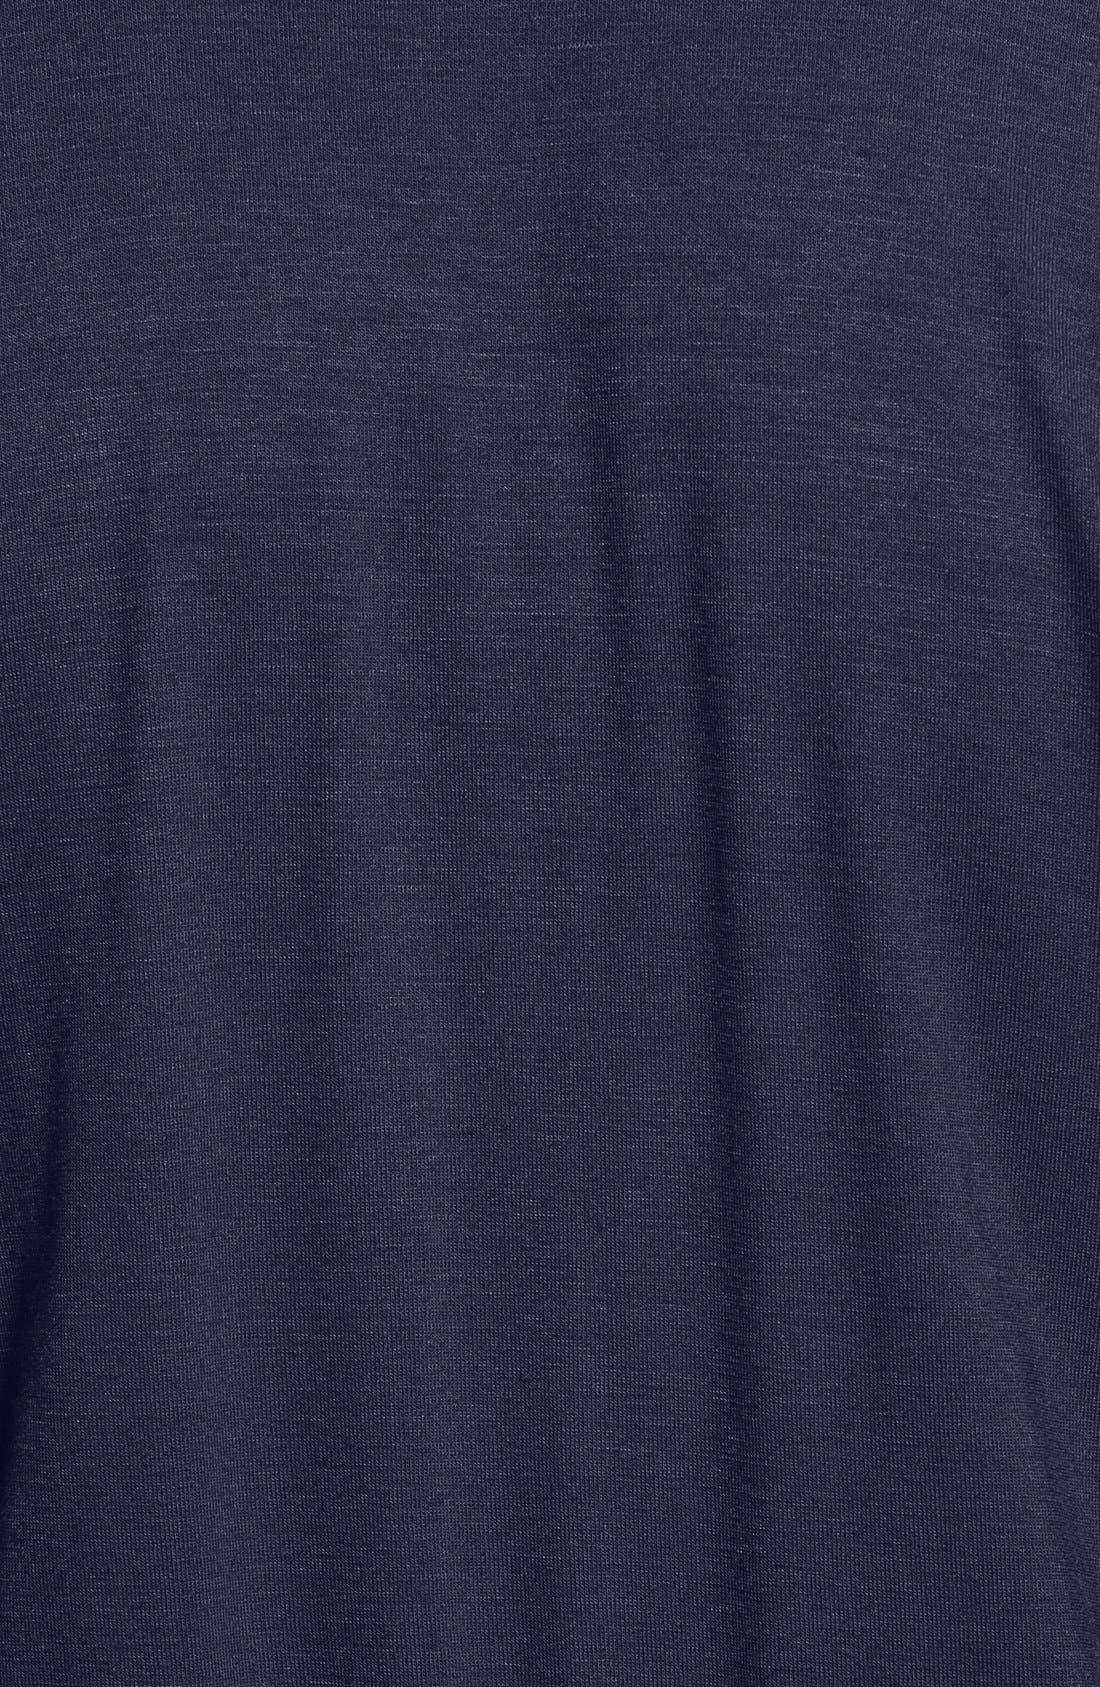 Short Sleeve Wrap Top Jumpsuit,                             Alternate thumbnail 6, color,                             Midnight Blue